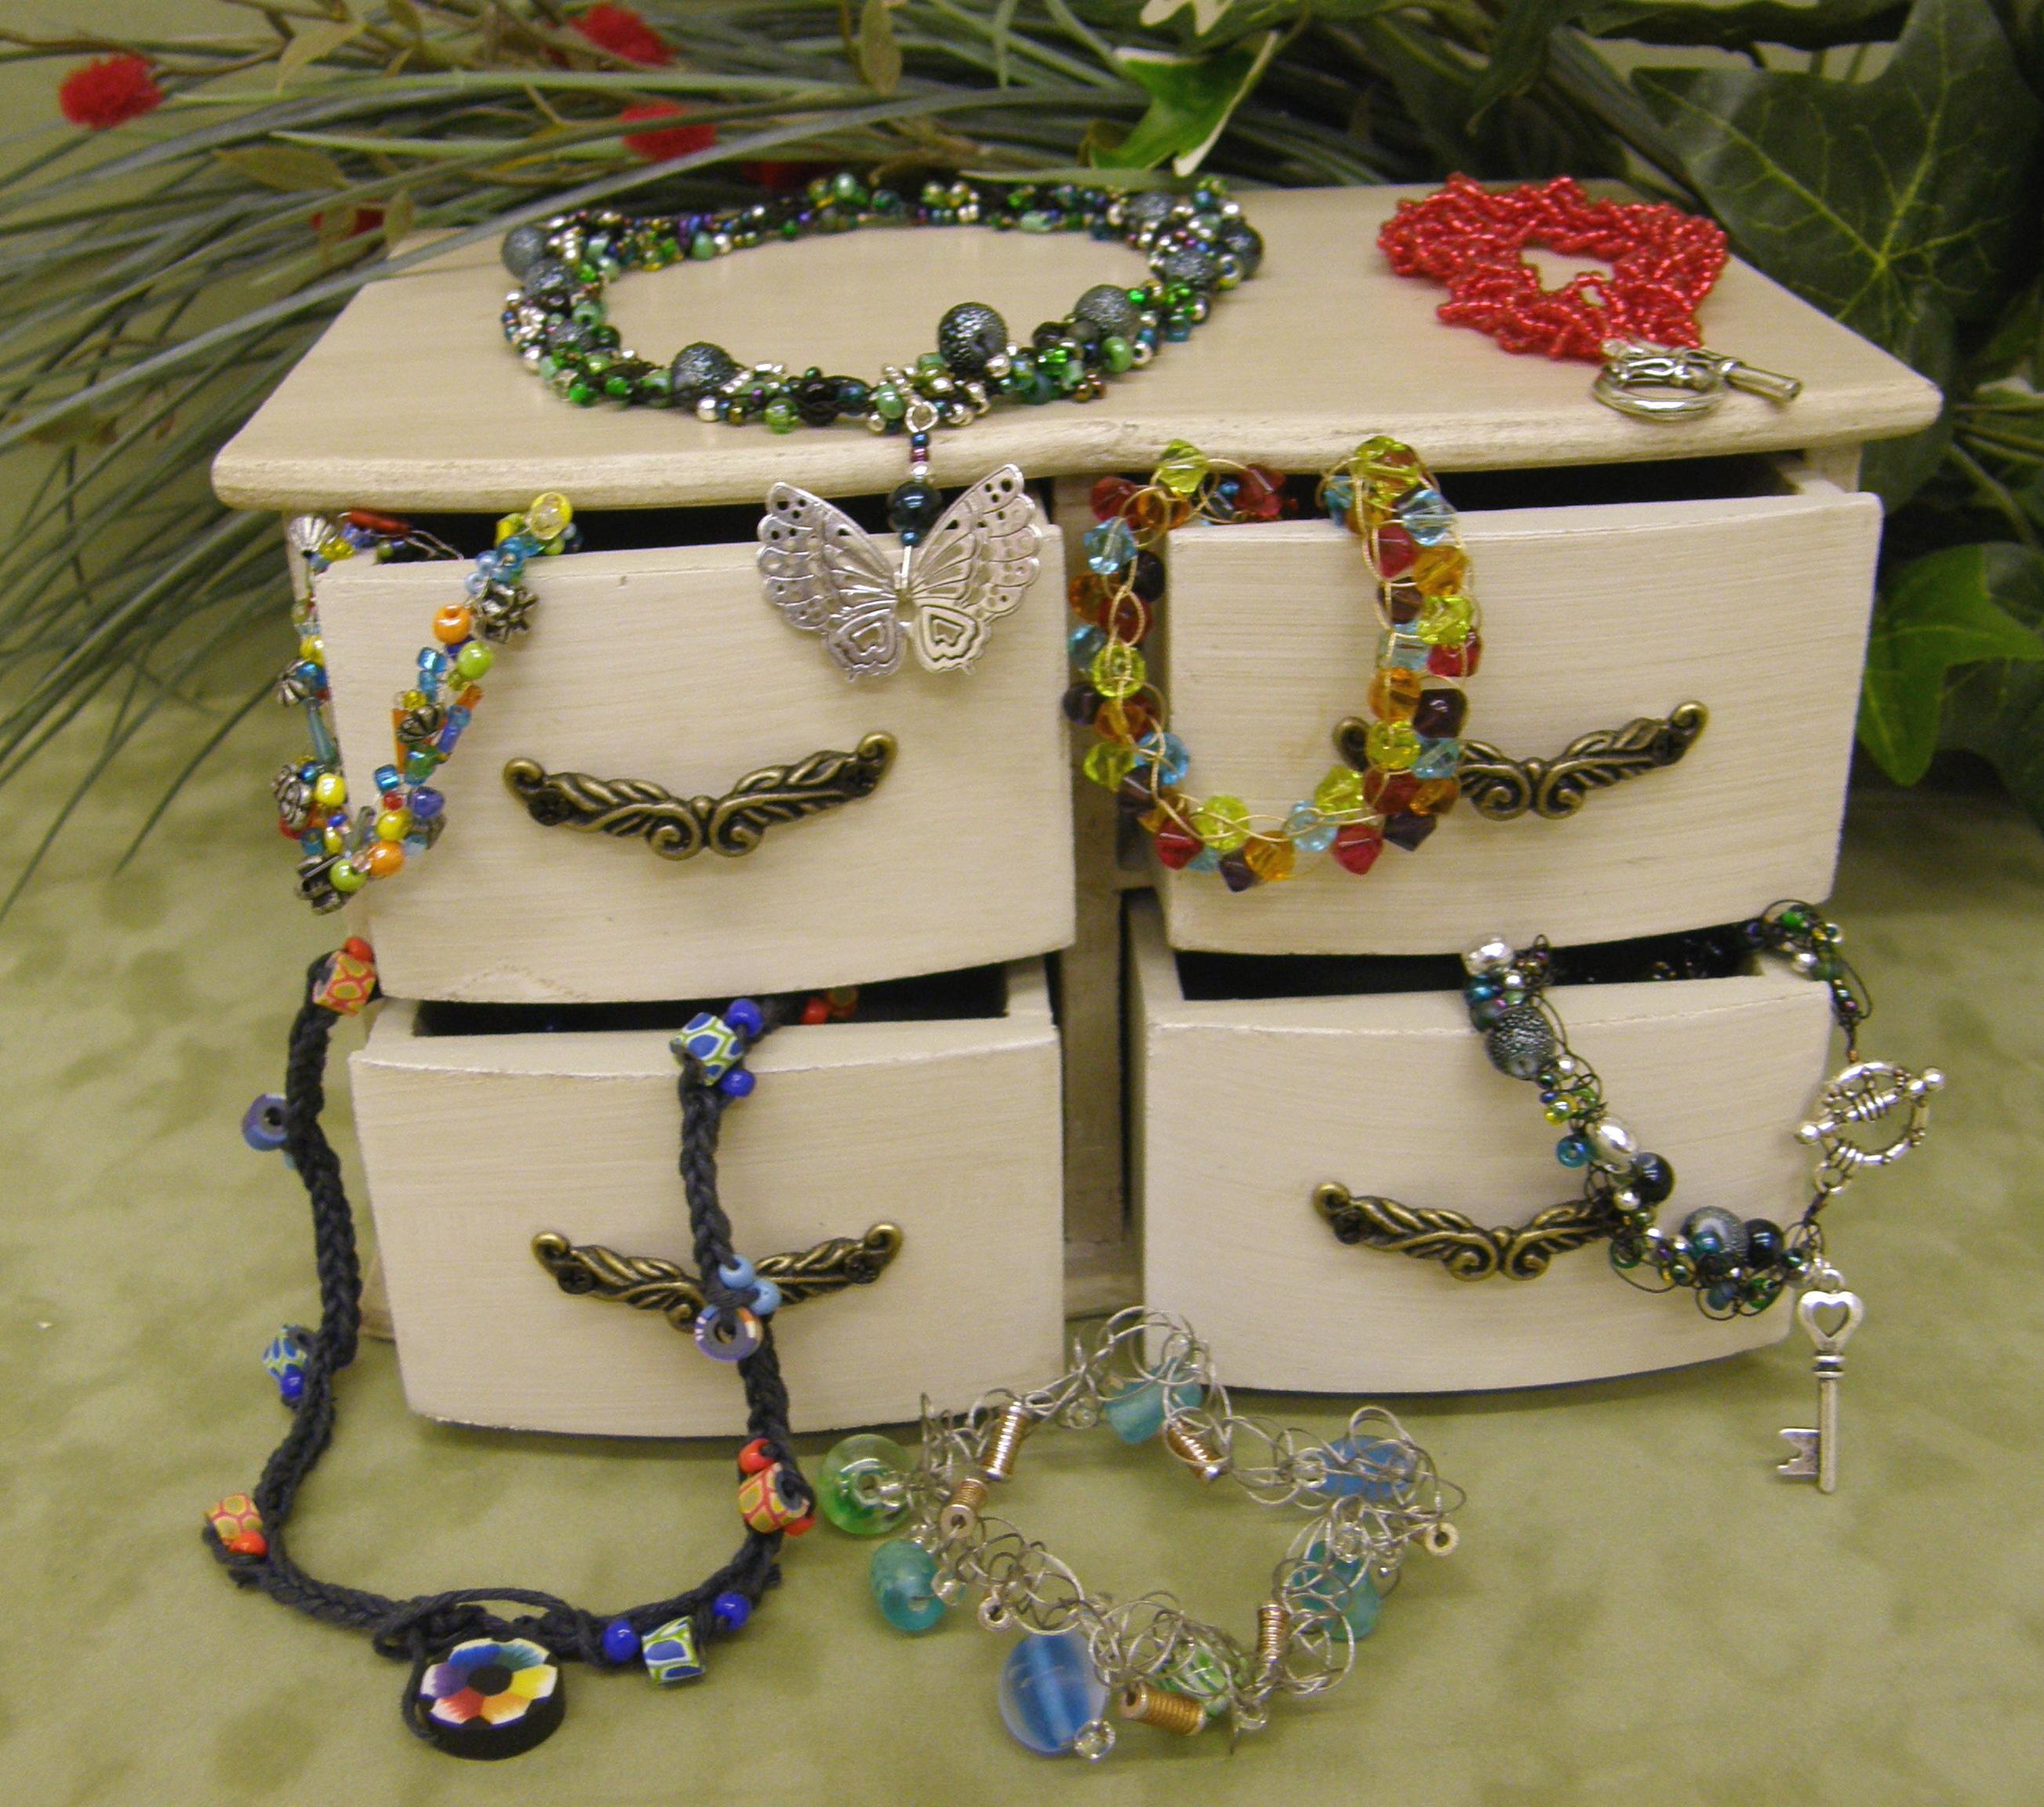 treasure-trove-of-loomed-jewels